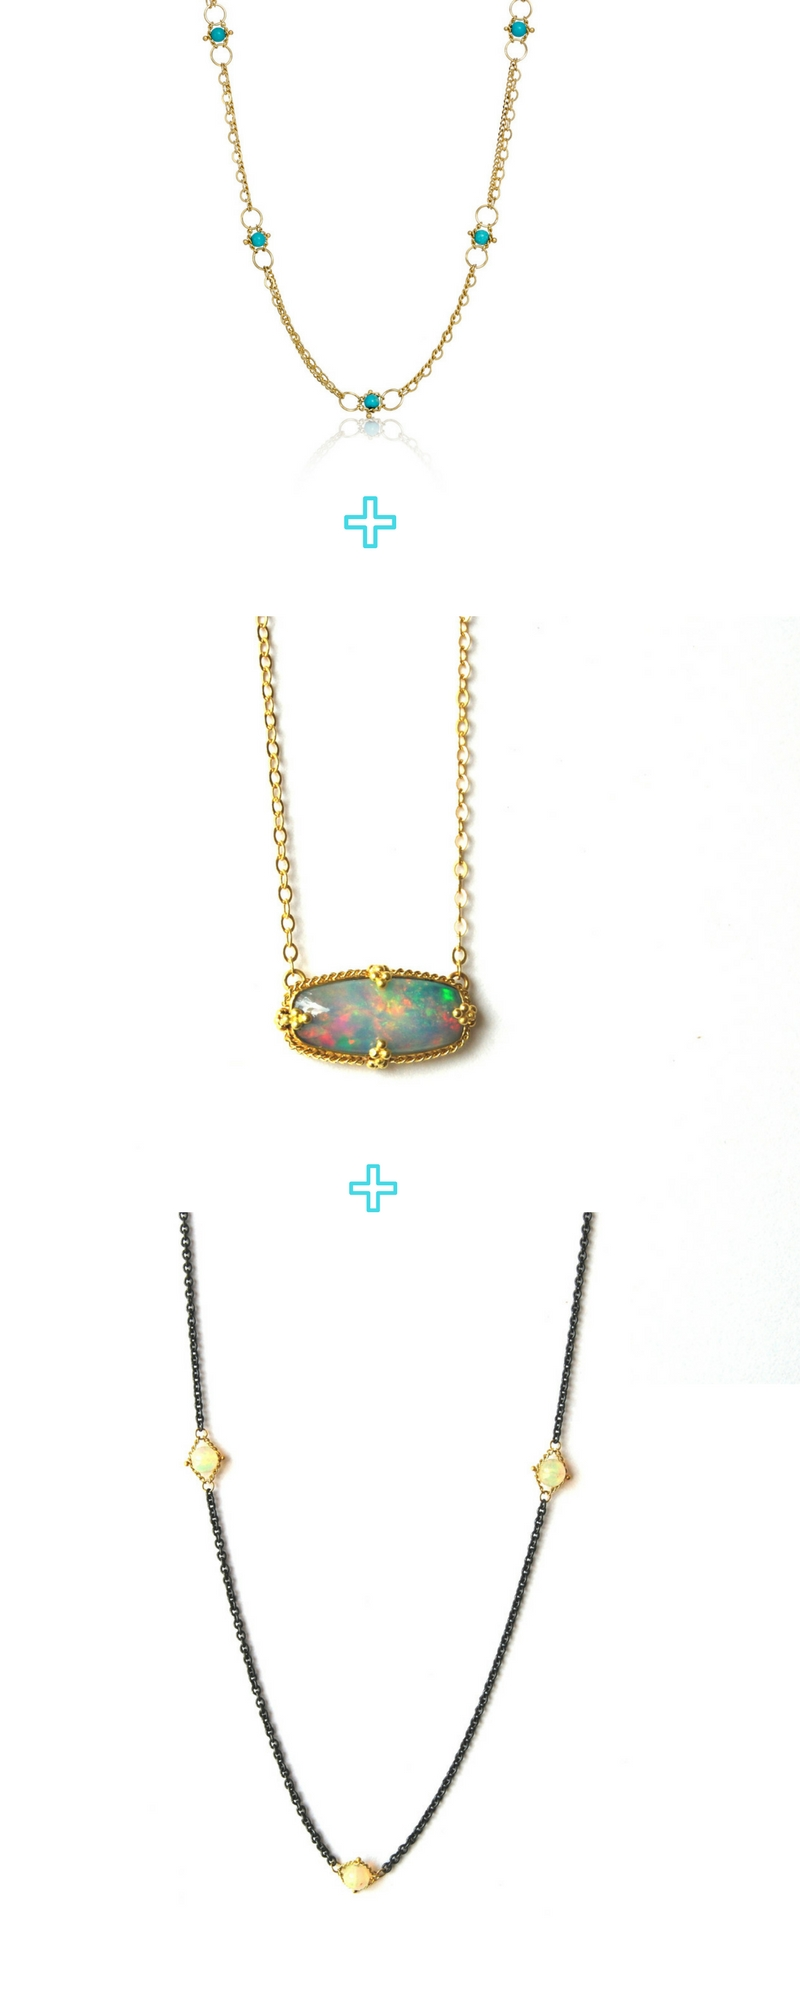 Melissa Quick necklaces